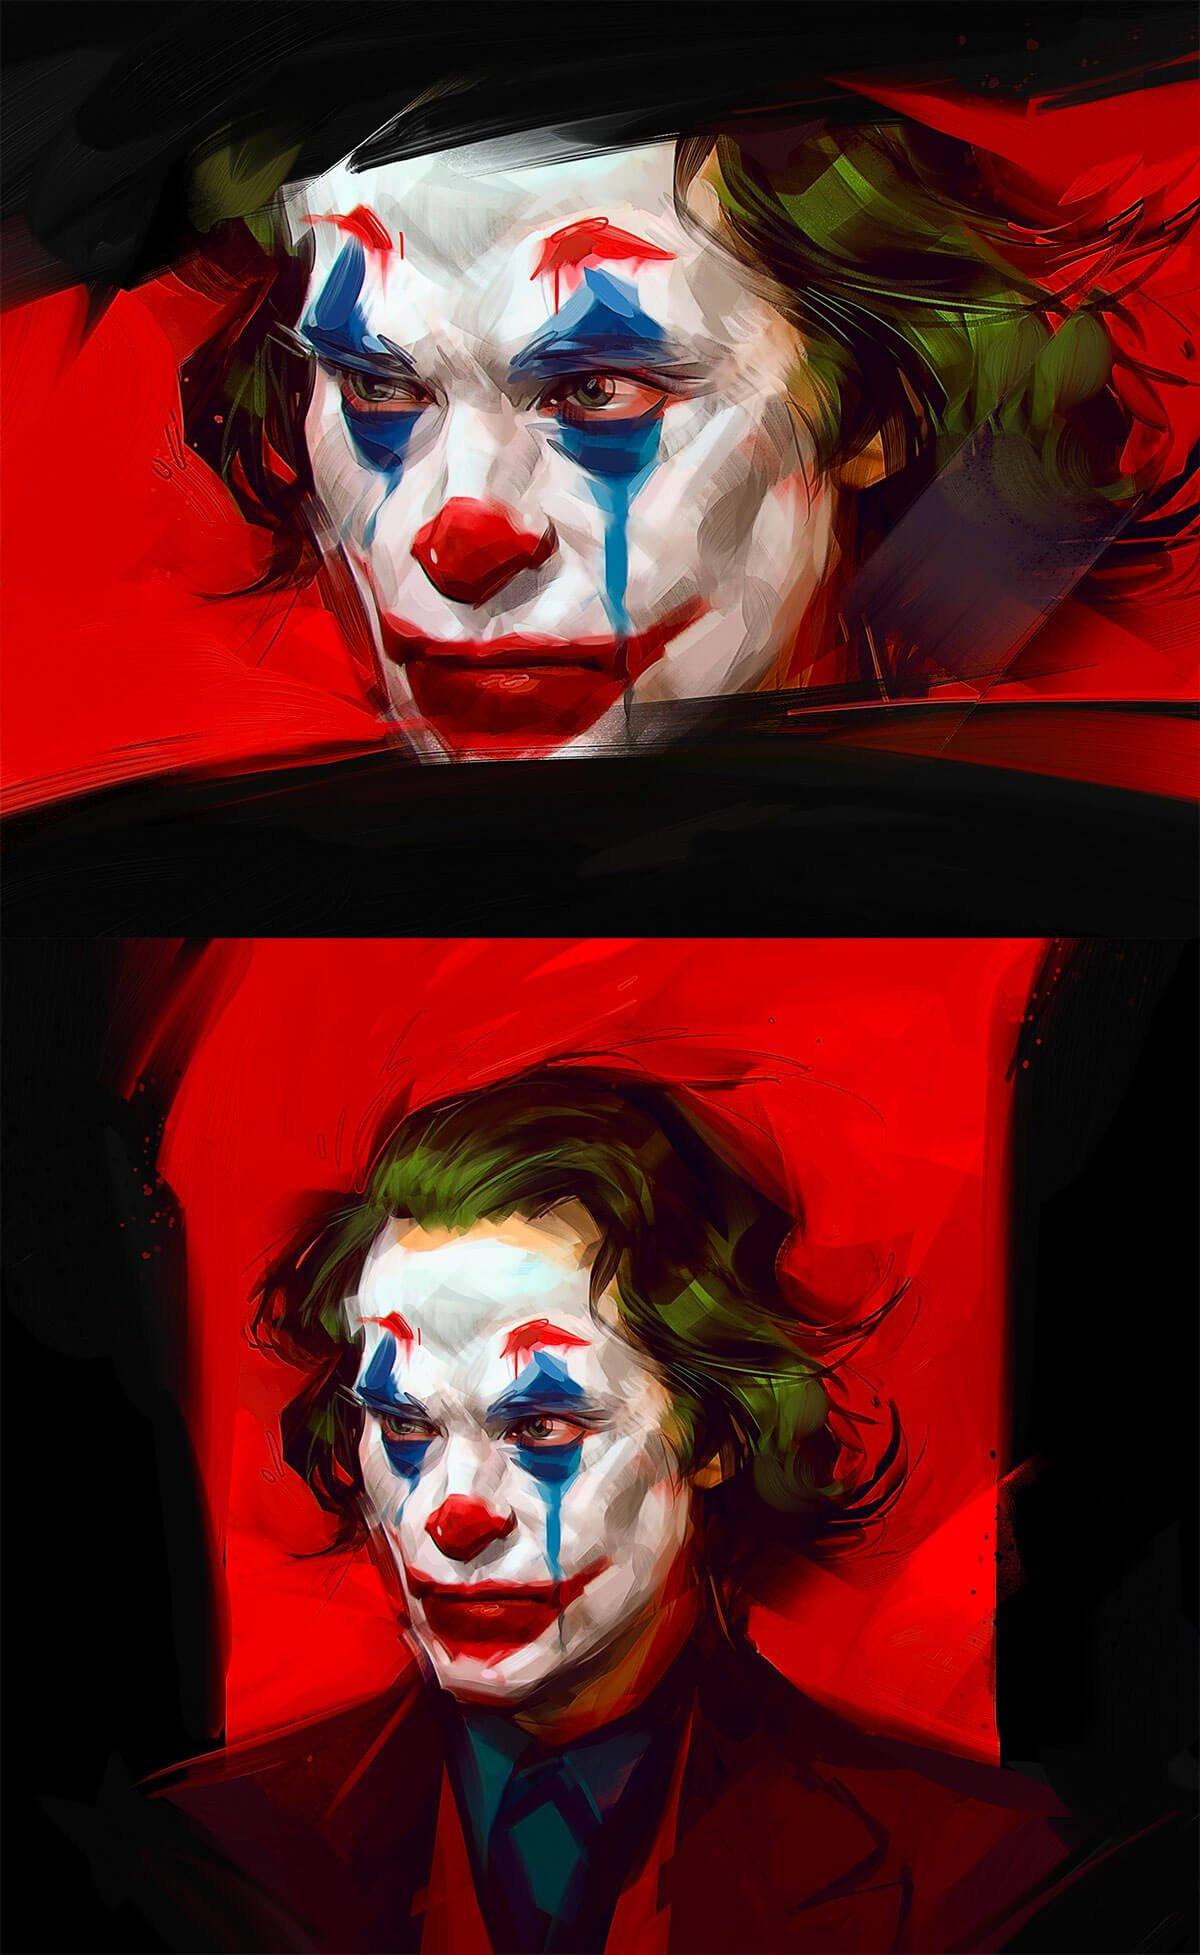 Joker Fan Art by Viktor Miller-Gausa